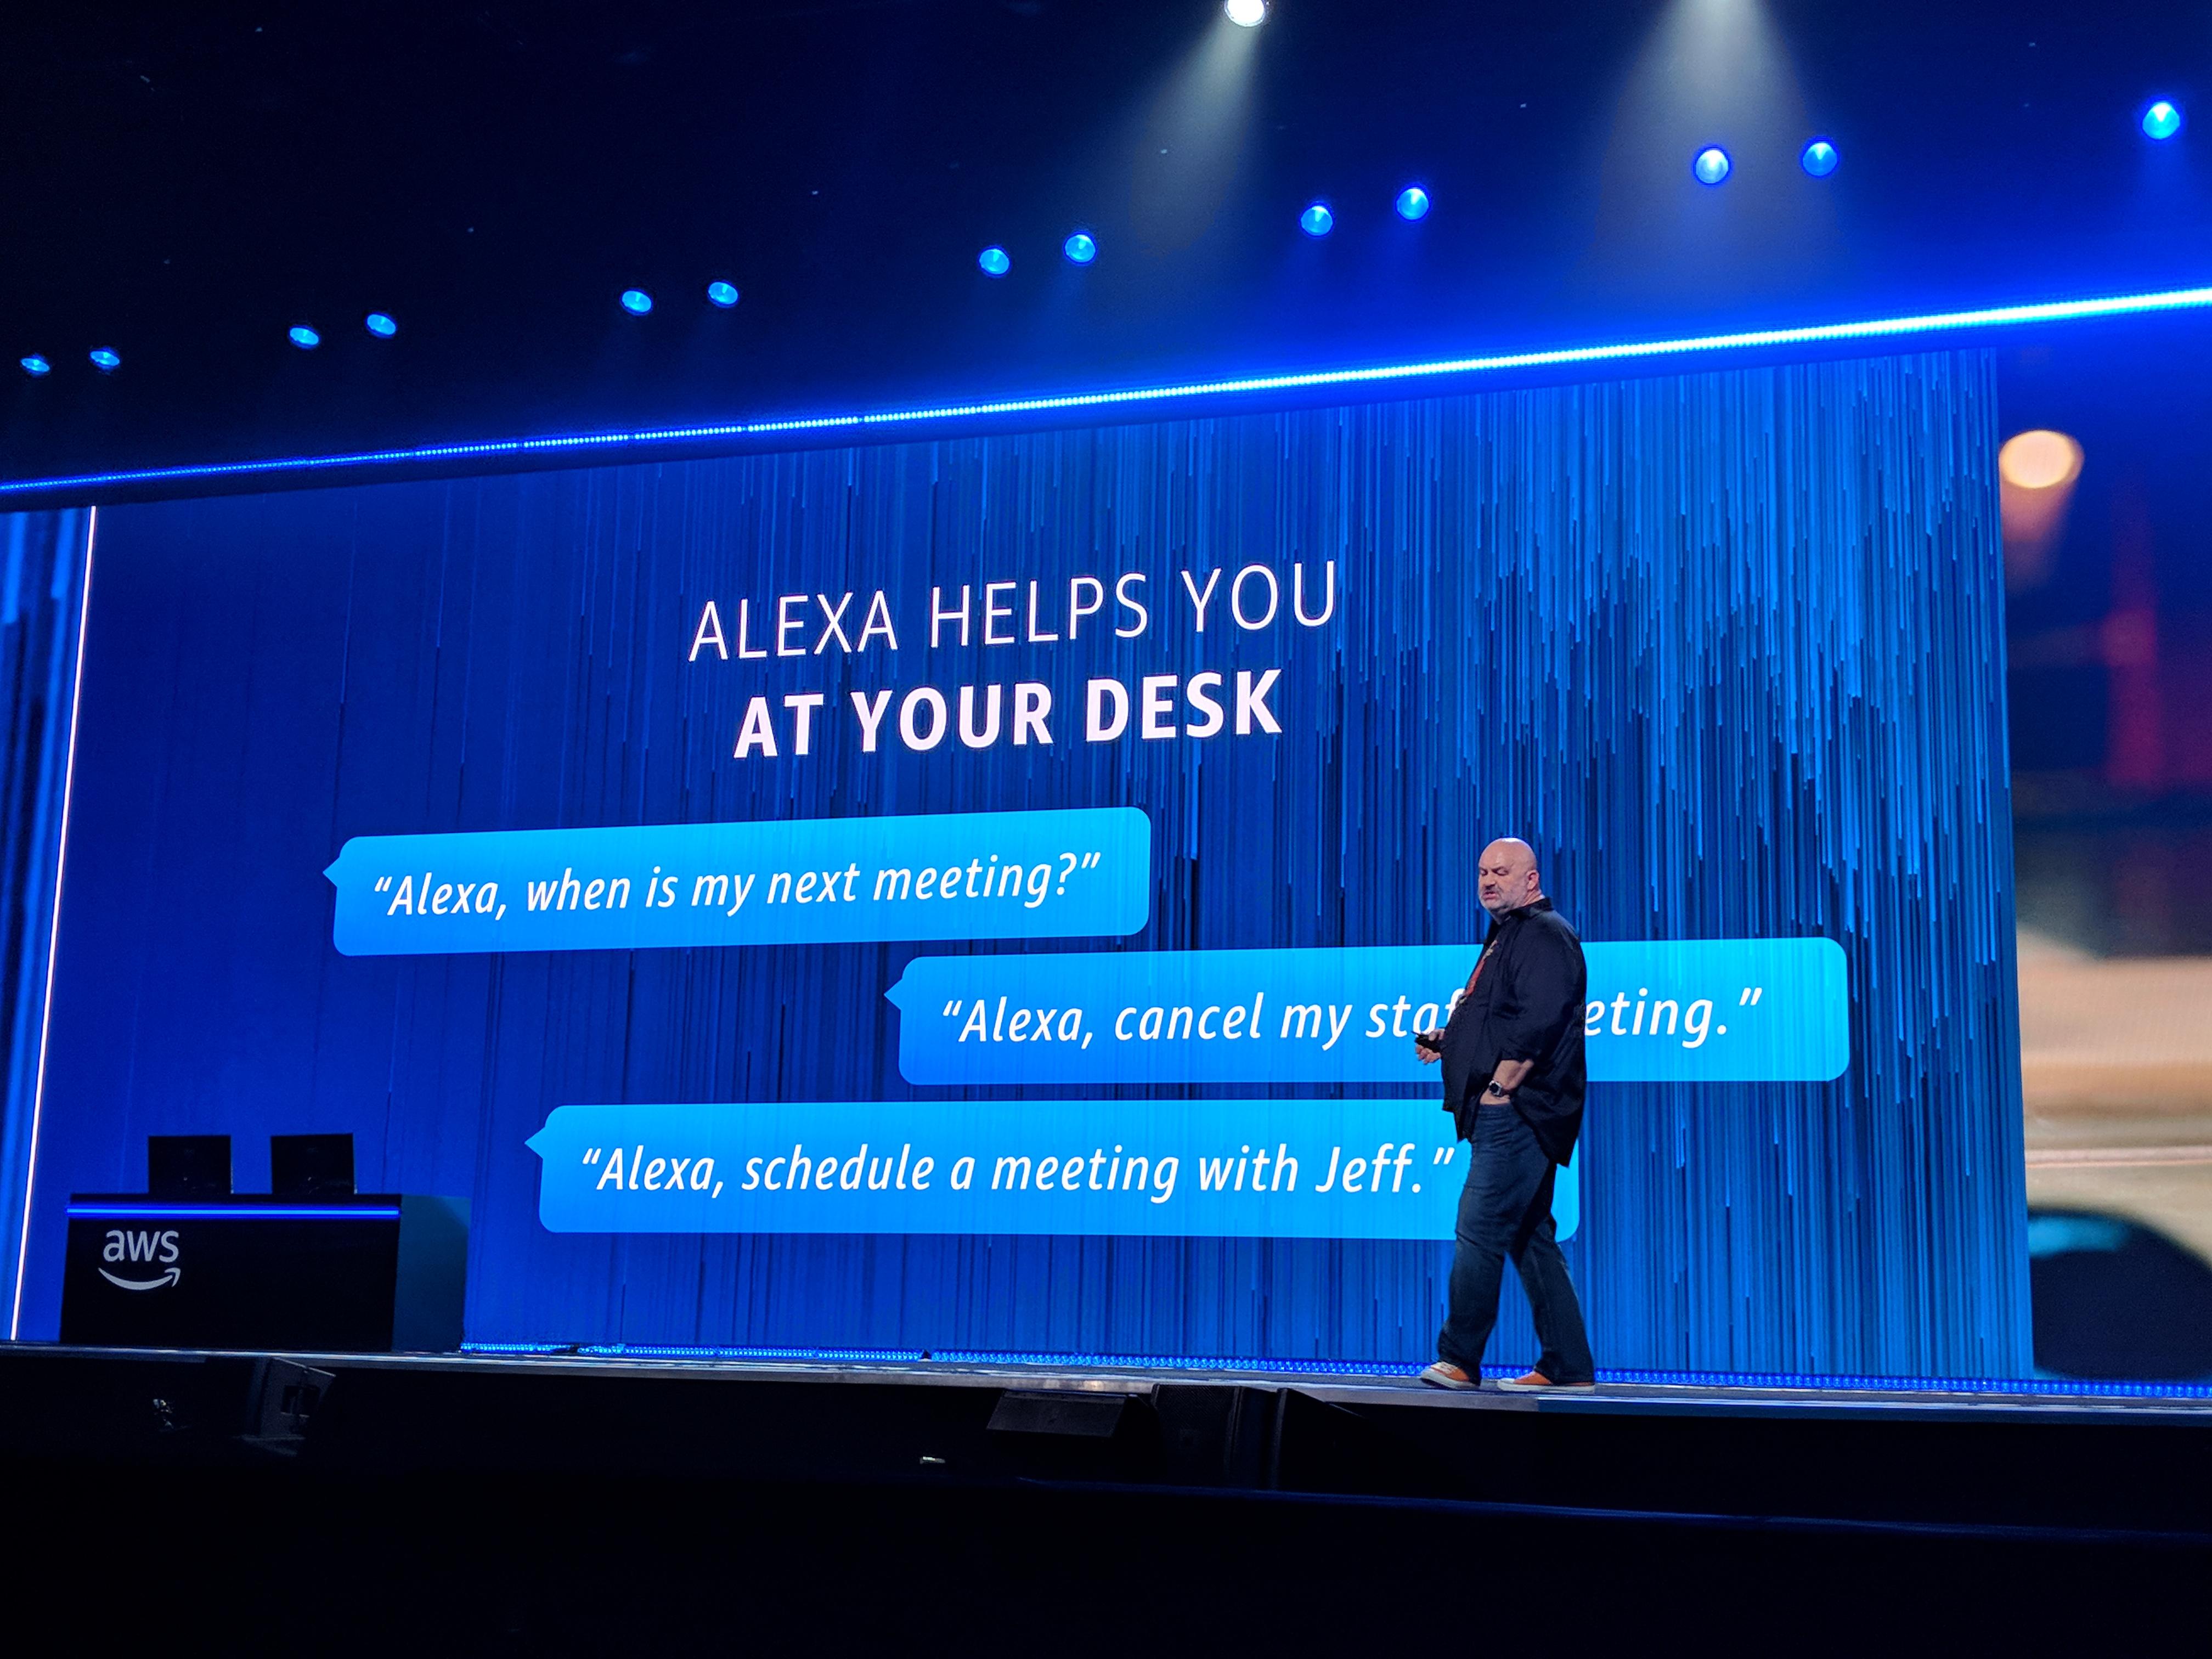 Amazon is putting Alexa in the office | TechCrunch